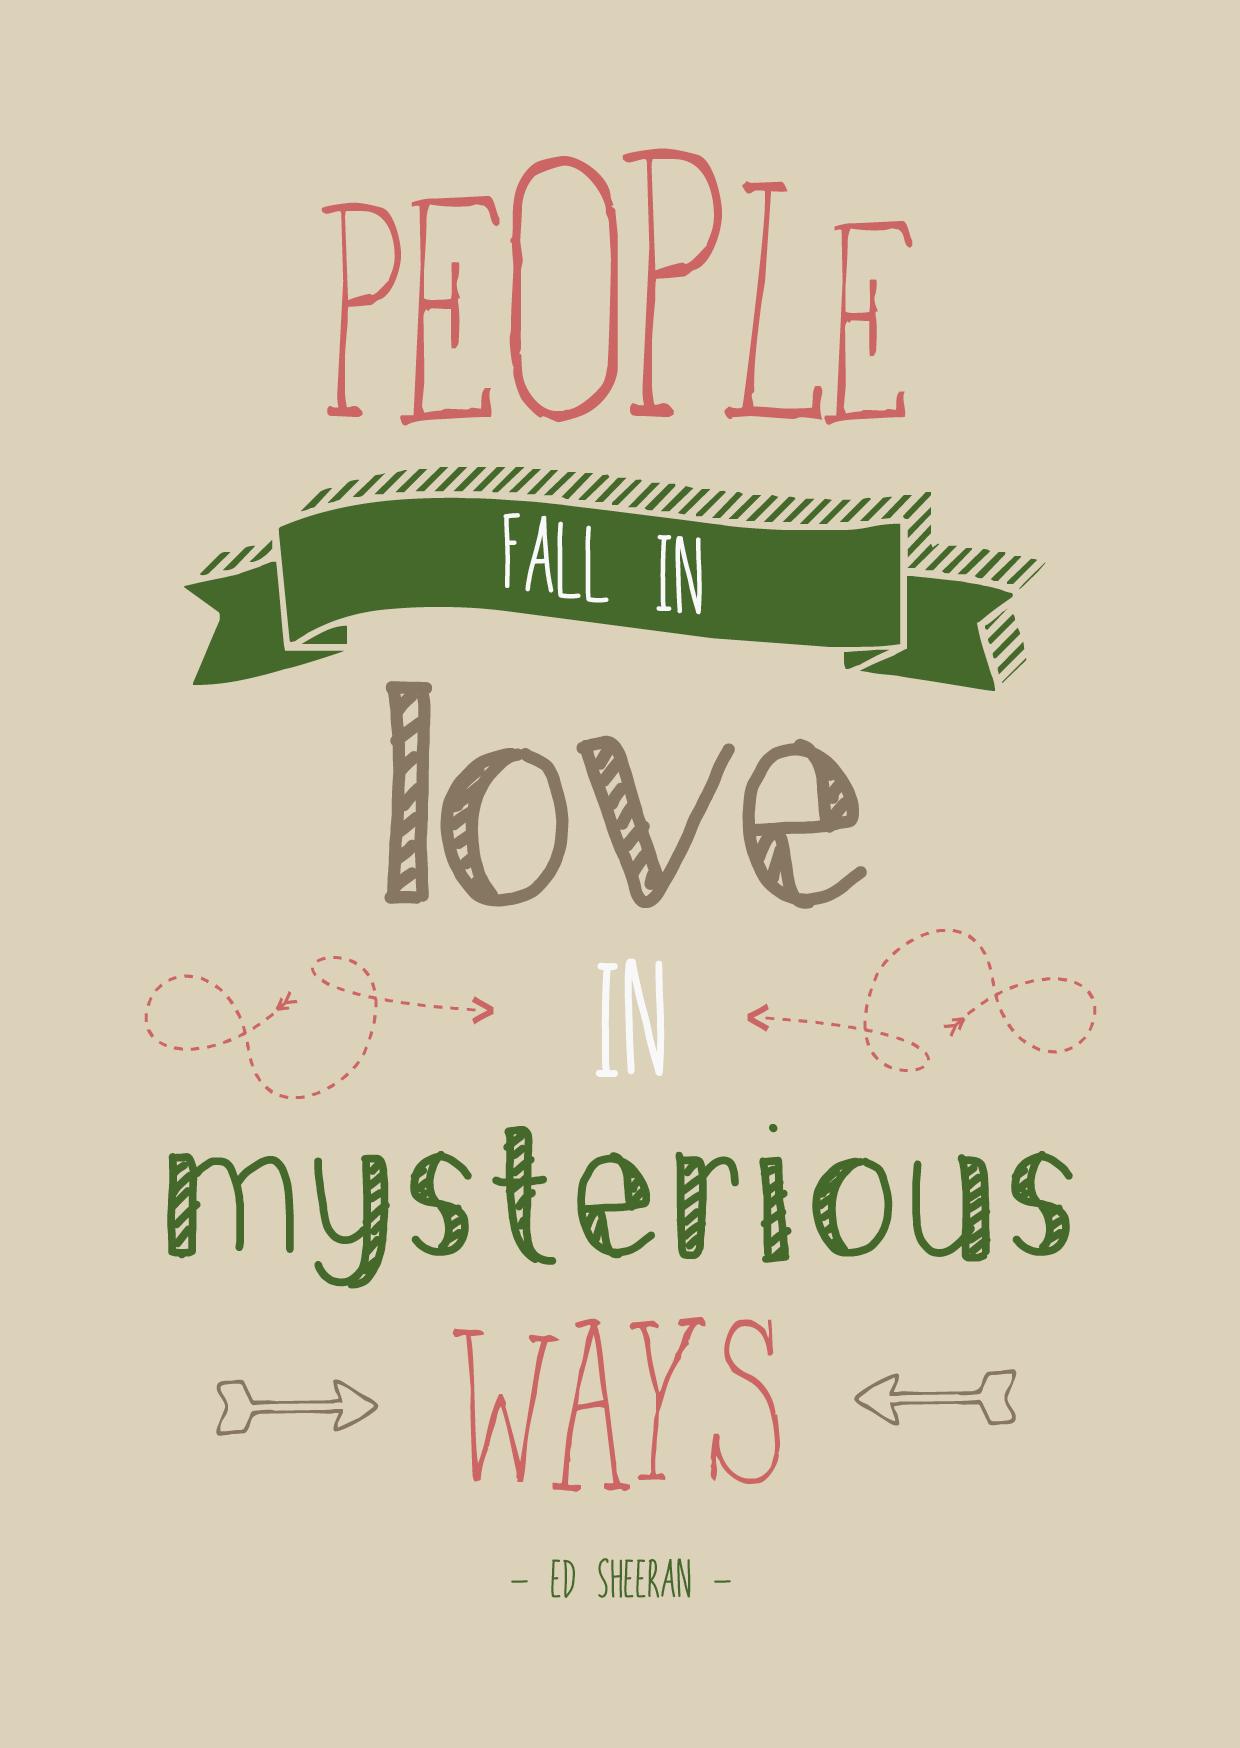 People fall in love in mysterious ways - Ed Sheeran   www.cheers-design.nl